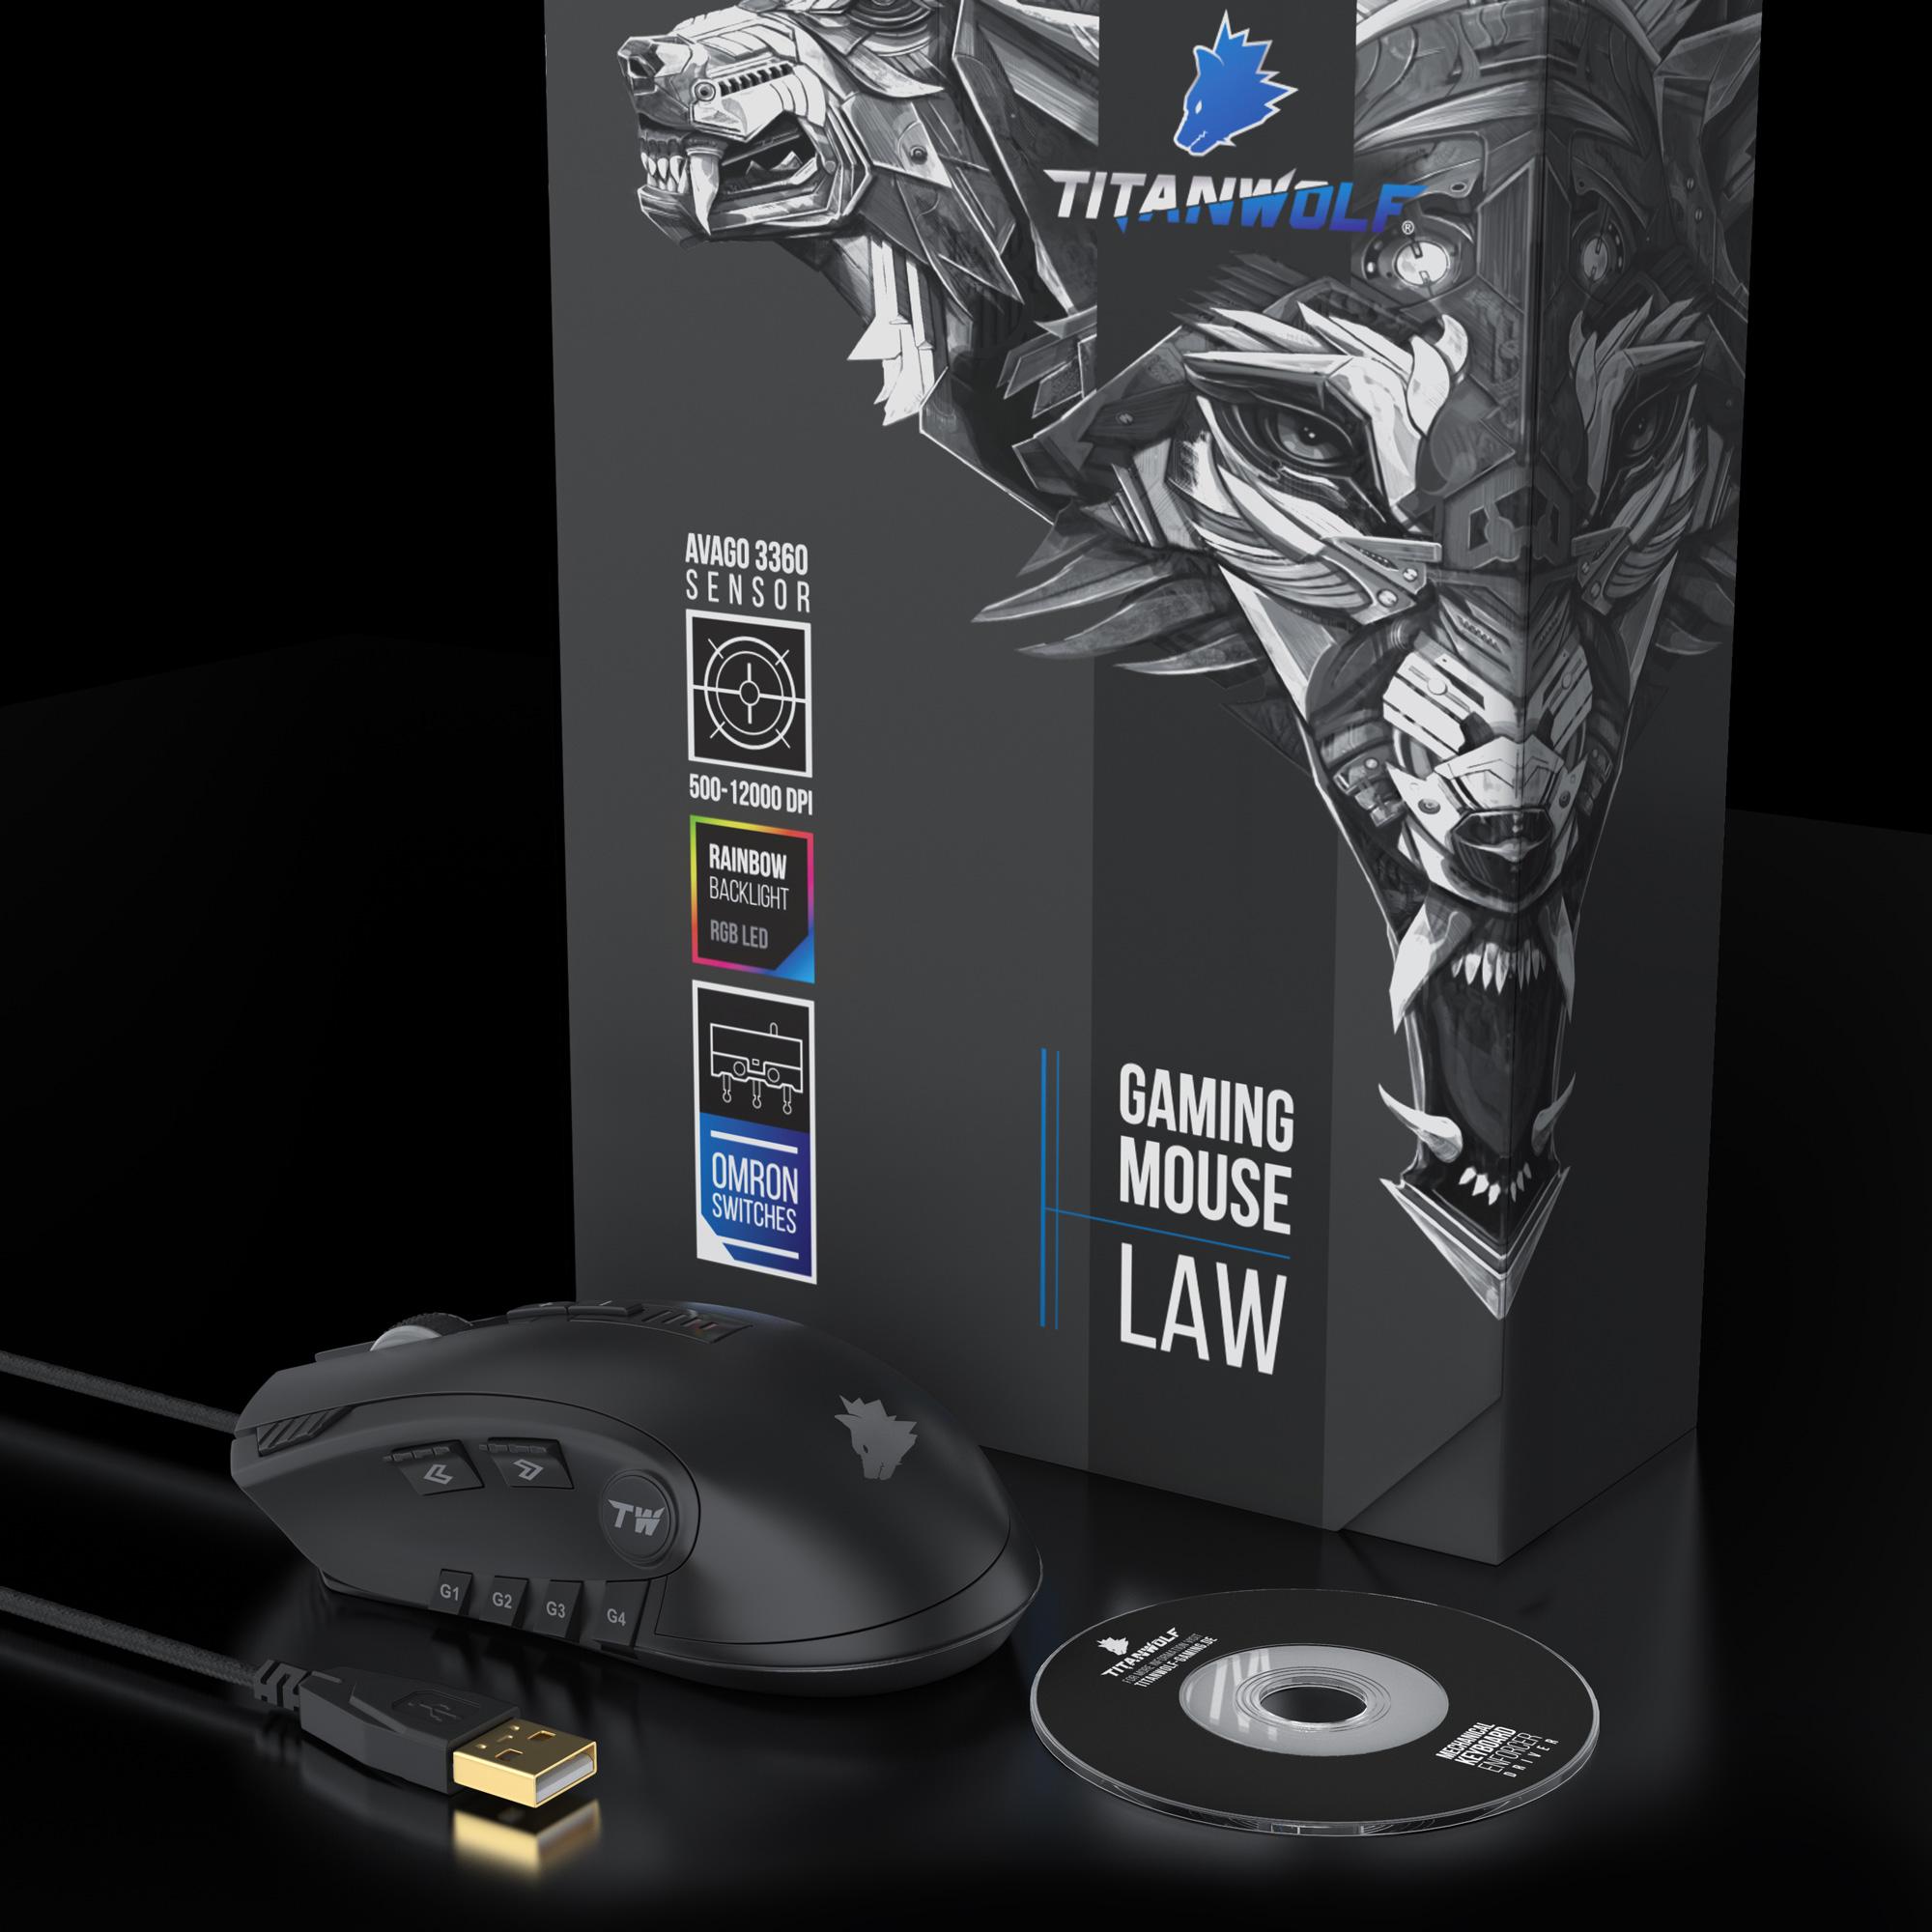 303339-Law-Packshot-black.jpg